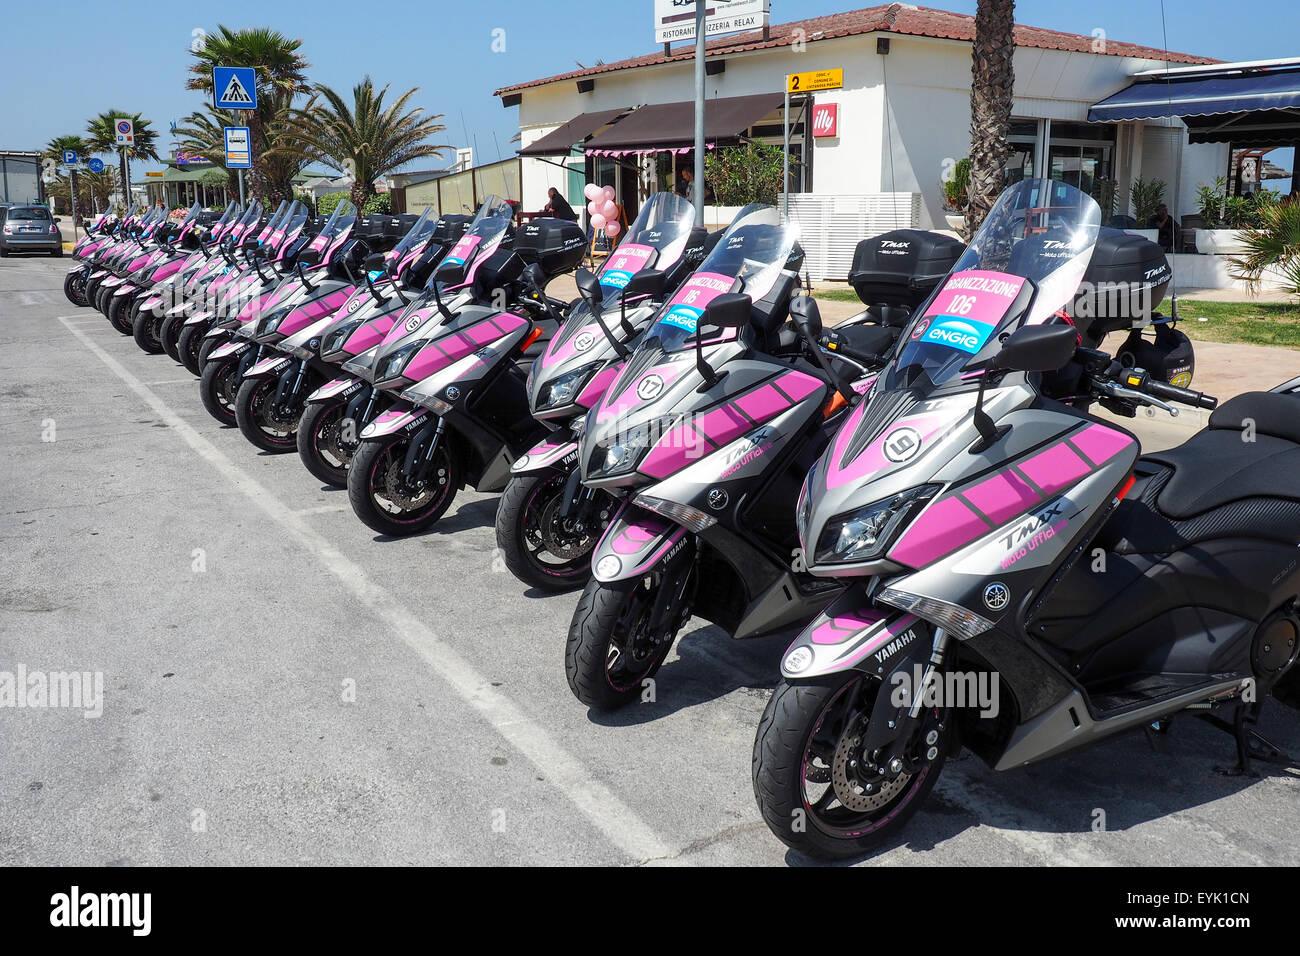 Fila del Giro d'Italia oficial motocicletas estacionados fuera de un restaurante. Imagen De Stock